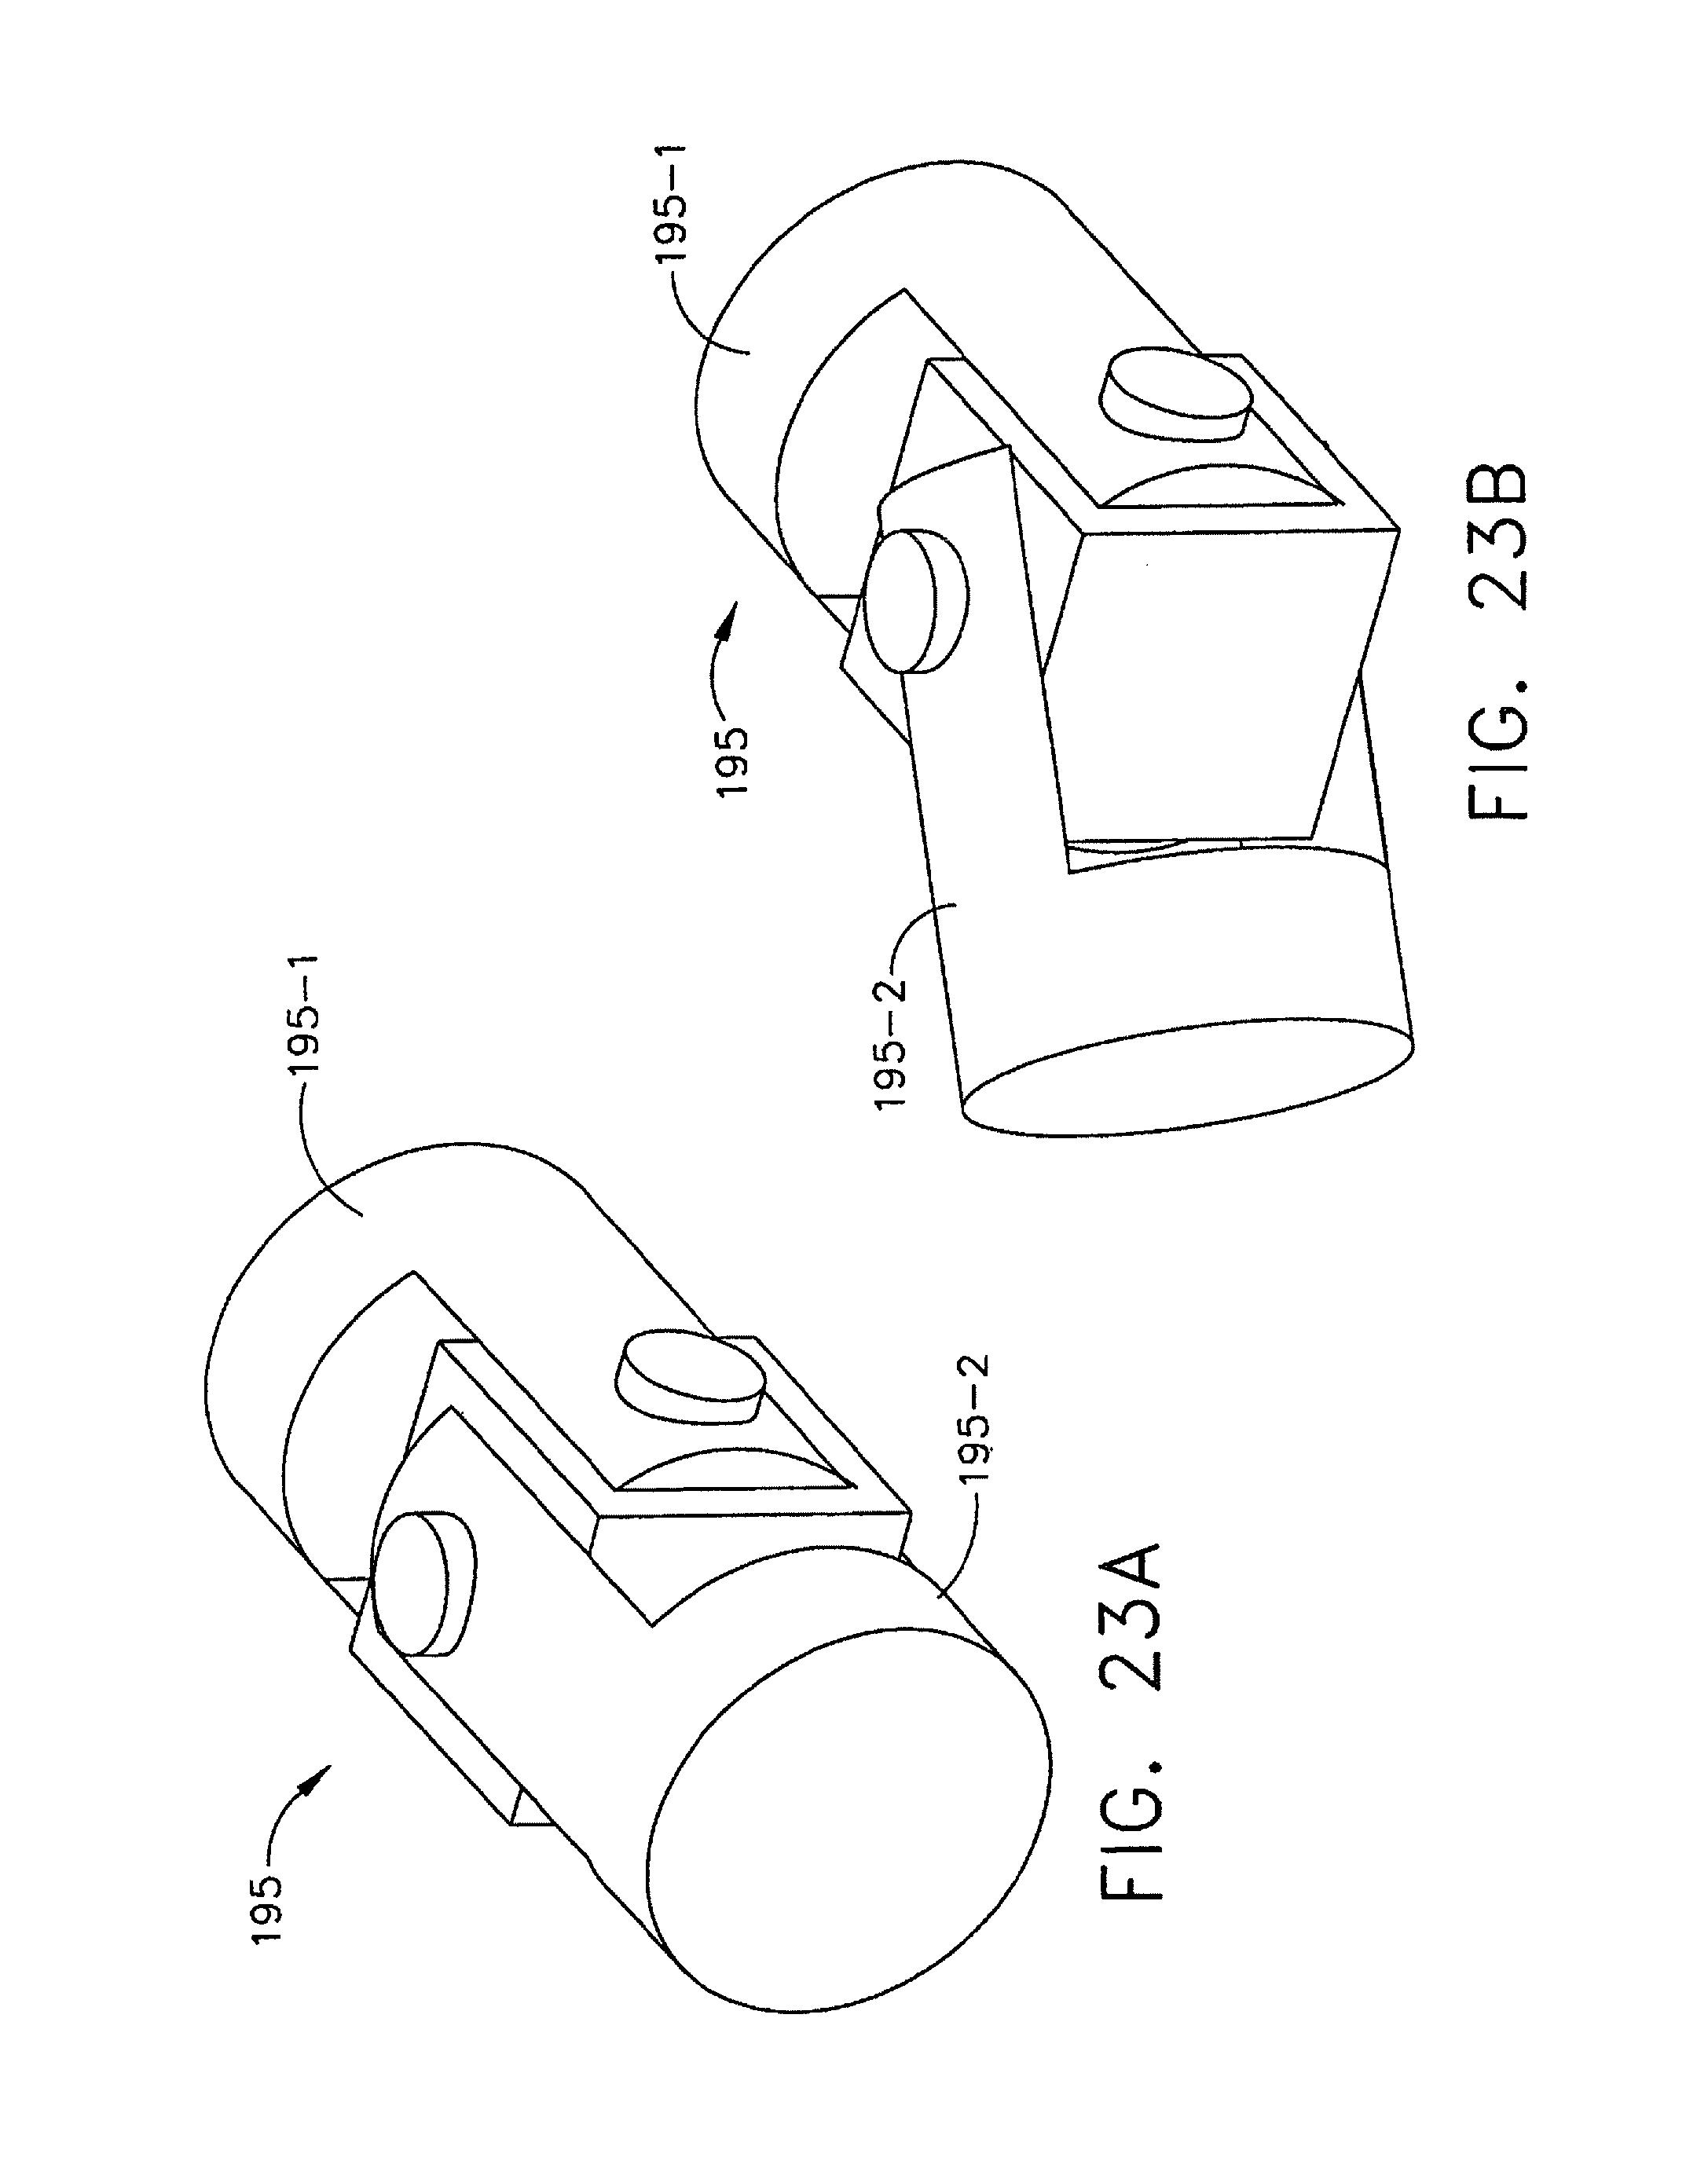 Us9439649b2 Surgical Instrument Having Force Feedback Capabilities 1952 International Engine Diagram Google Patents